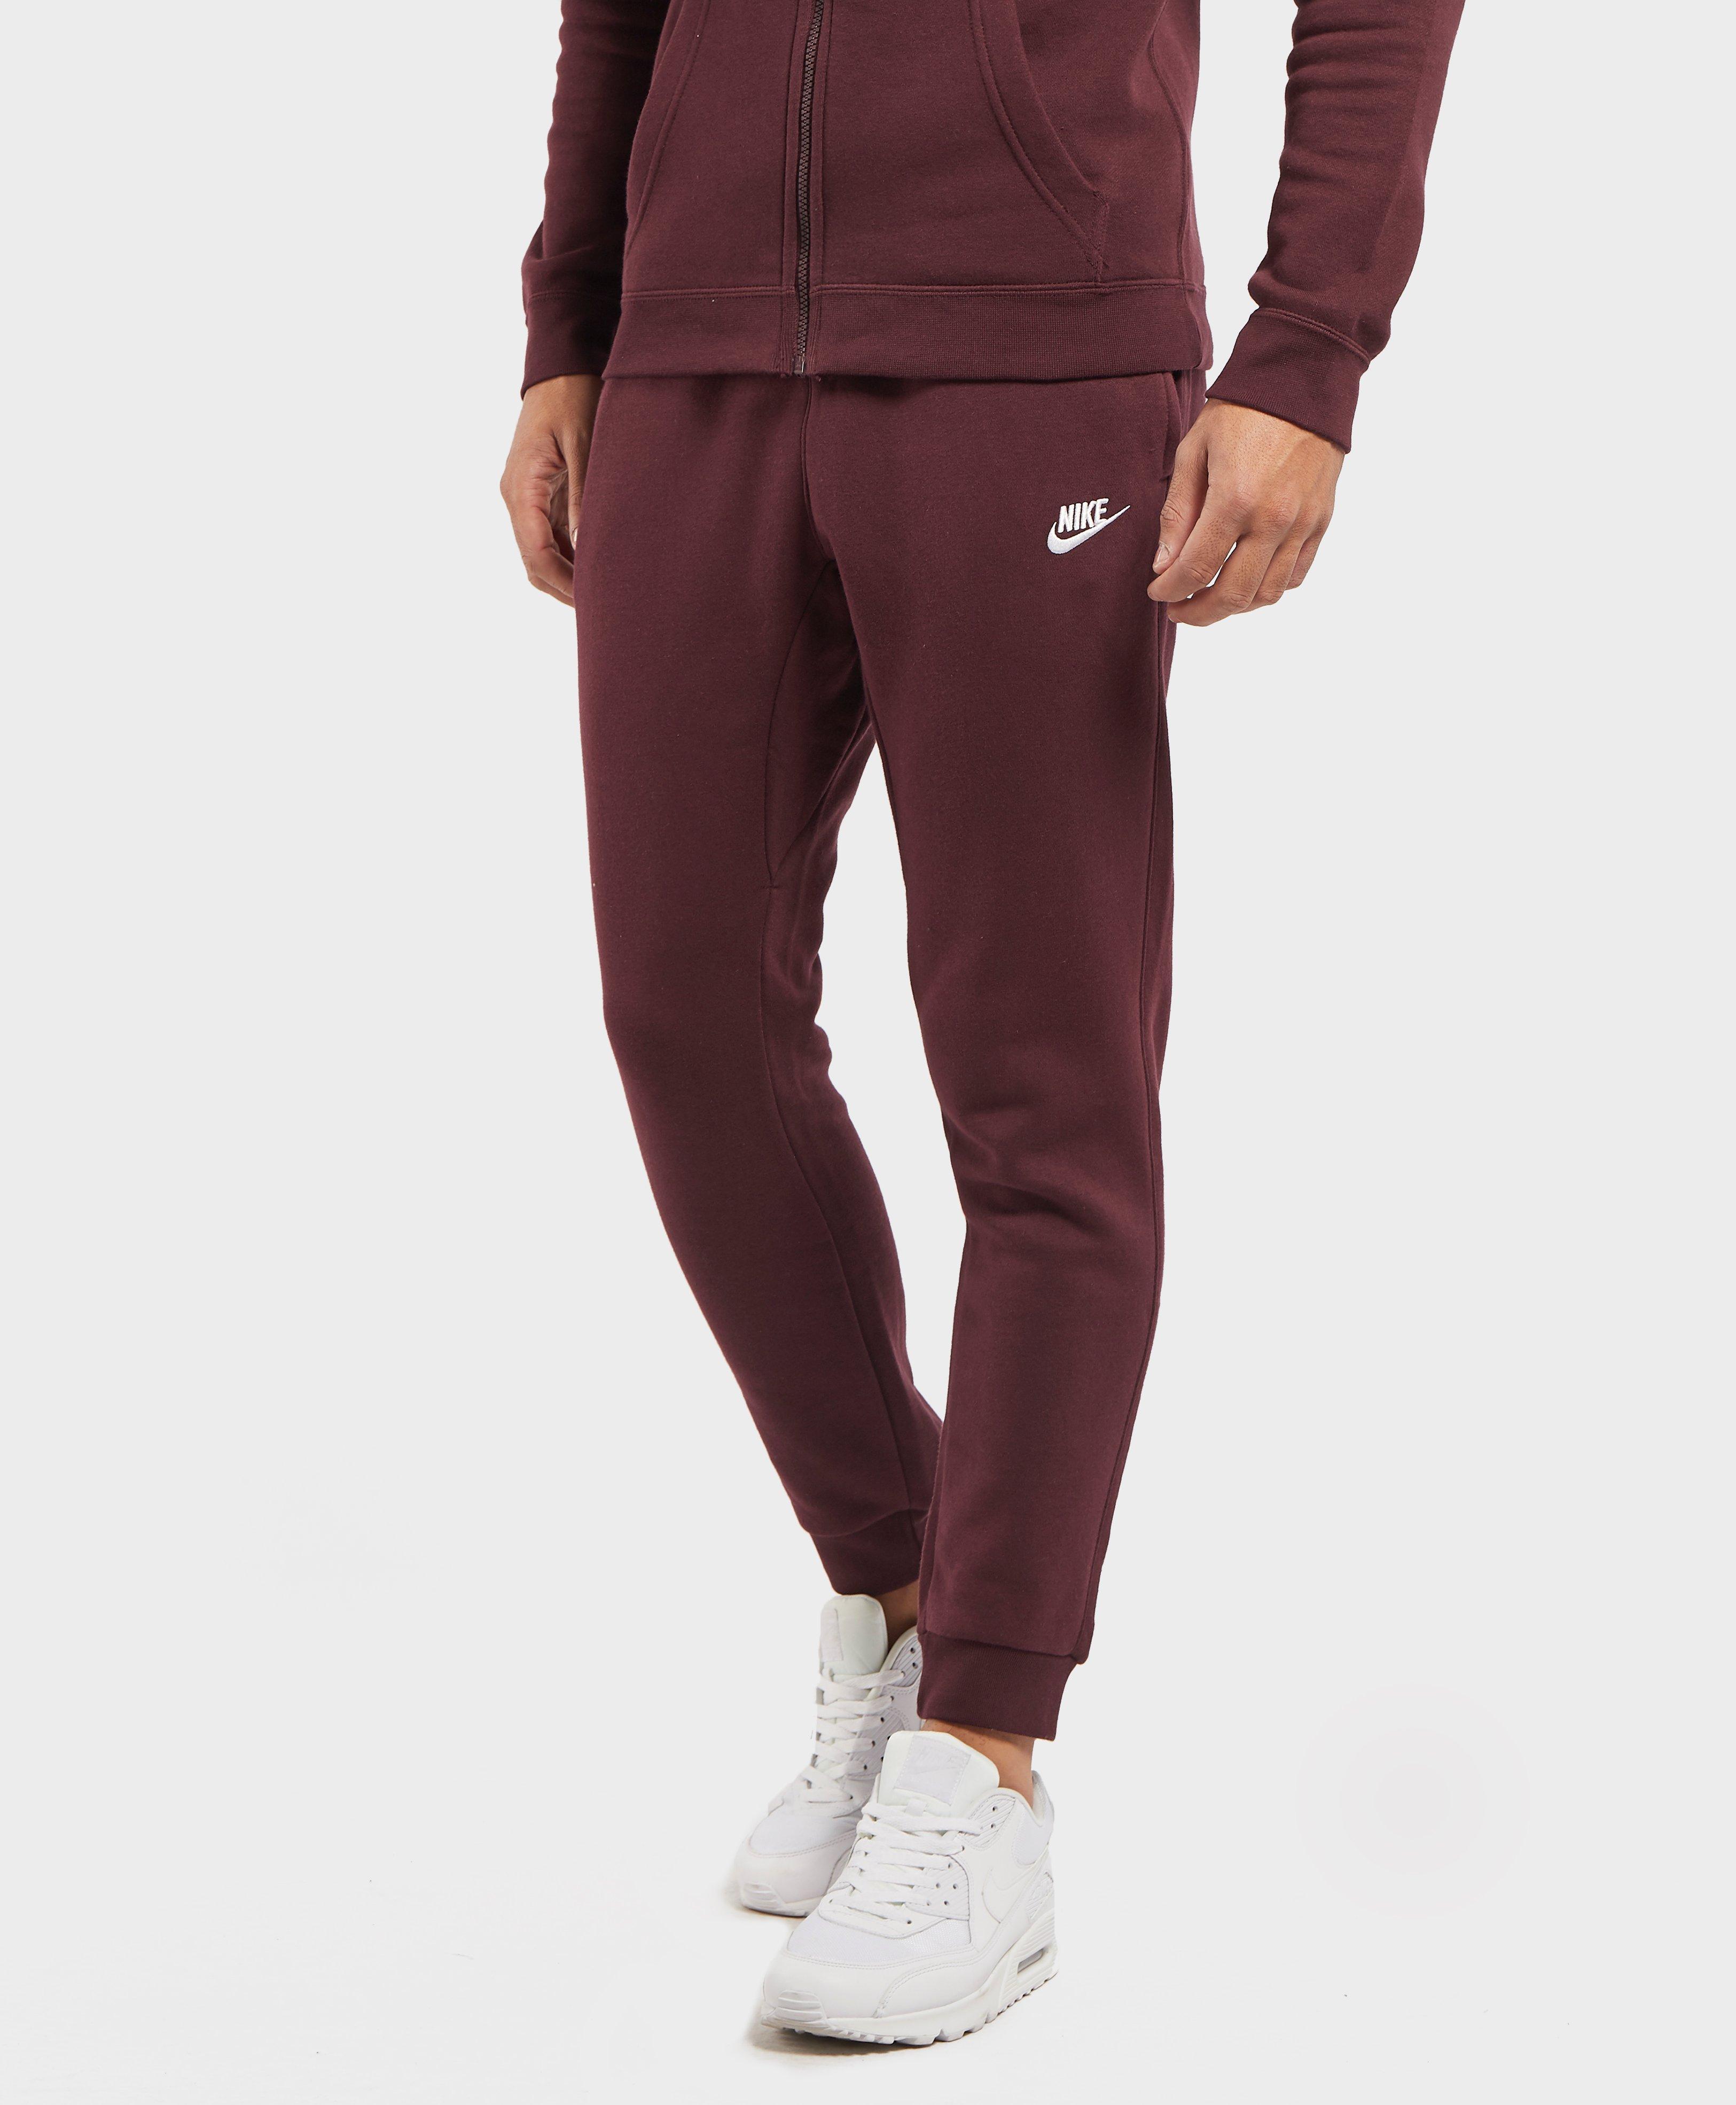 Nike Club Cuffed Fleece Pants in Red for Men - Lyst 4b30e5b541cf